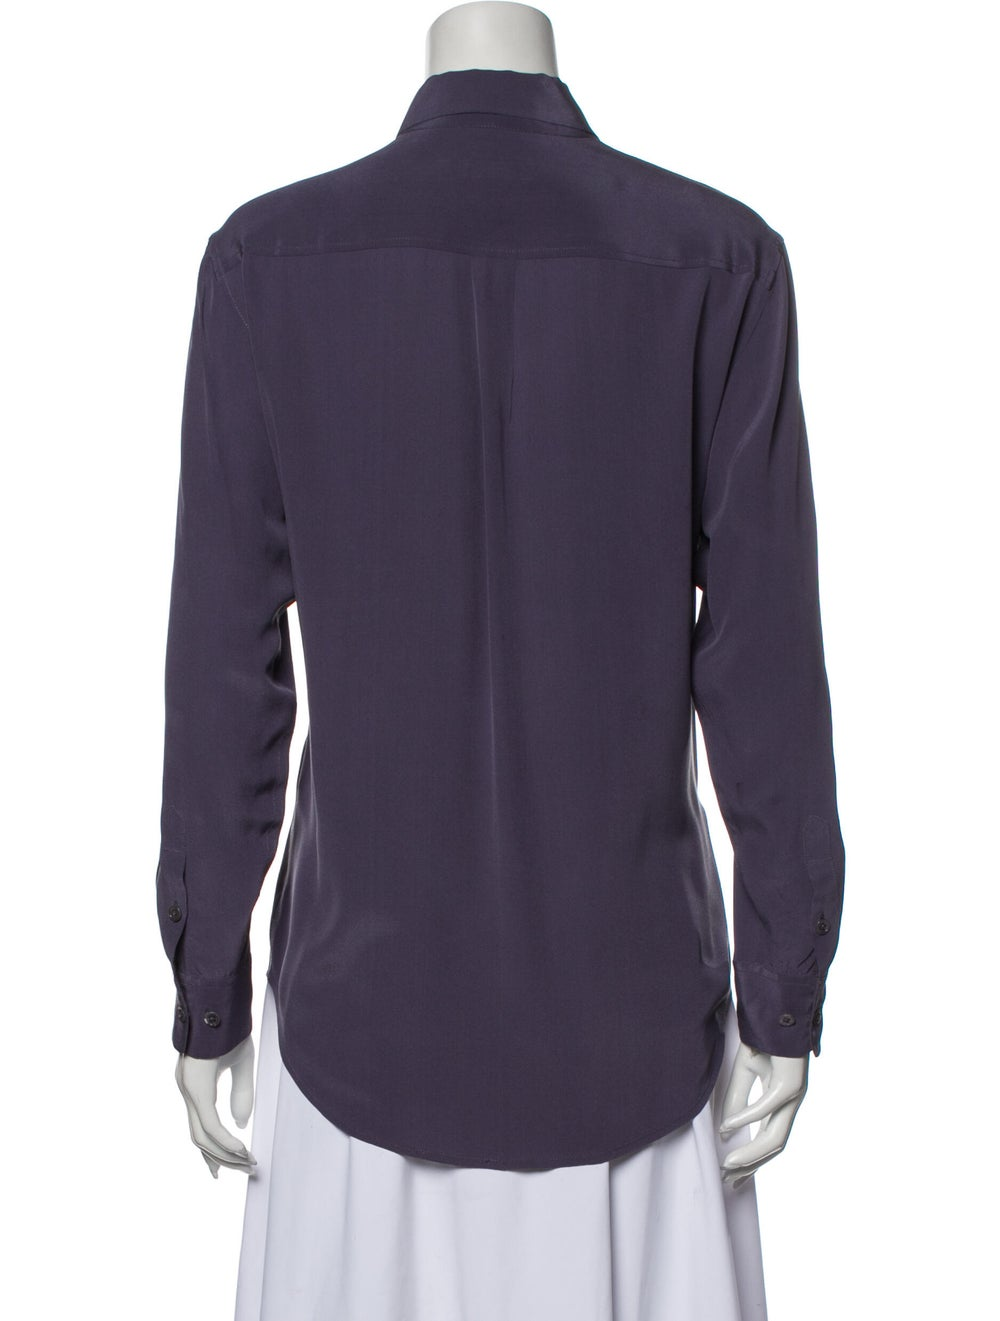 Equipment Silk Long Sleeve Button-Up Top Purple - image 3